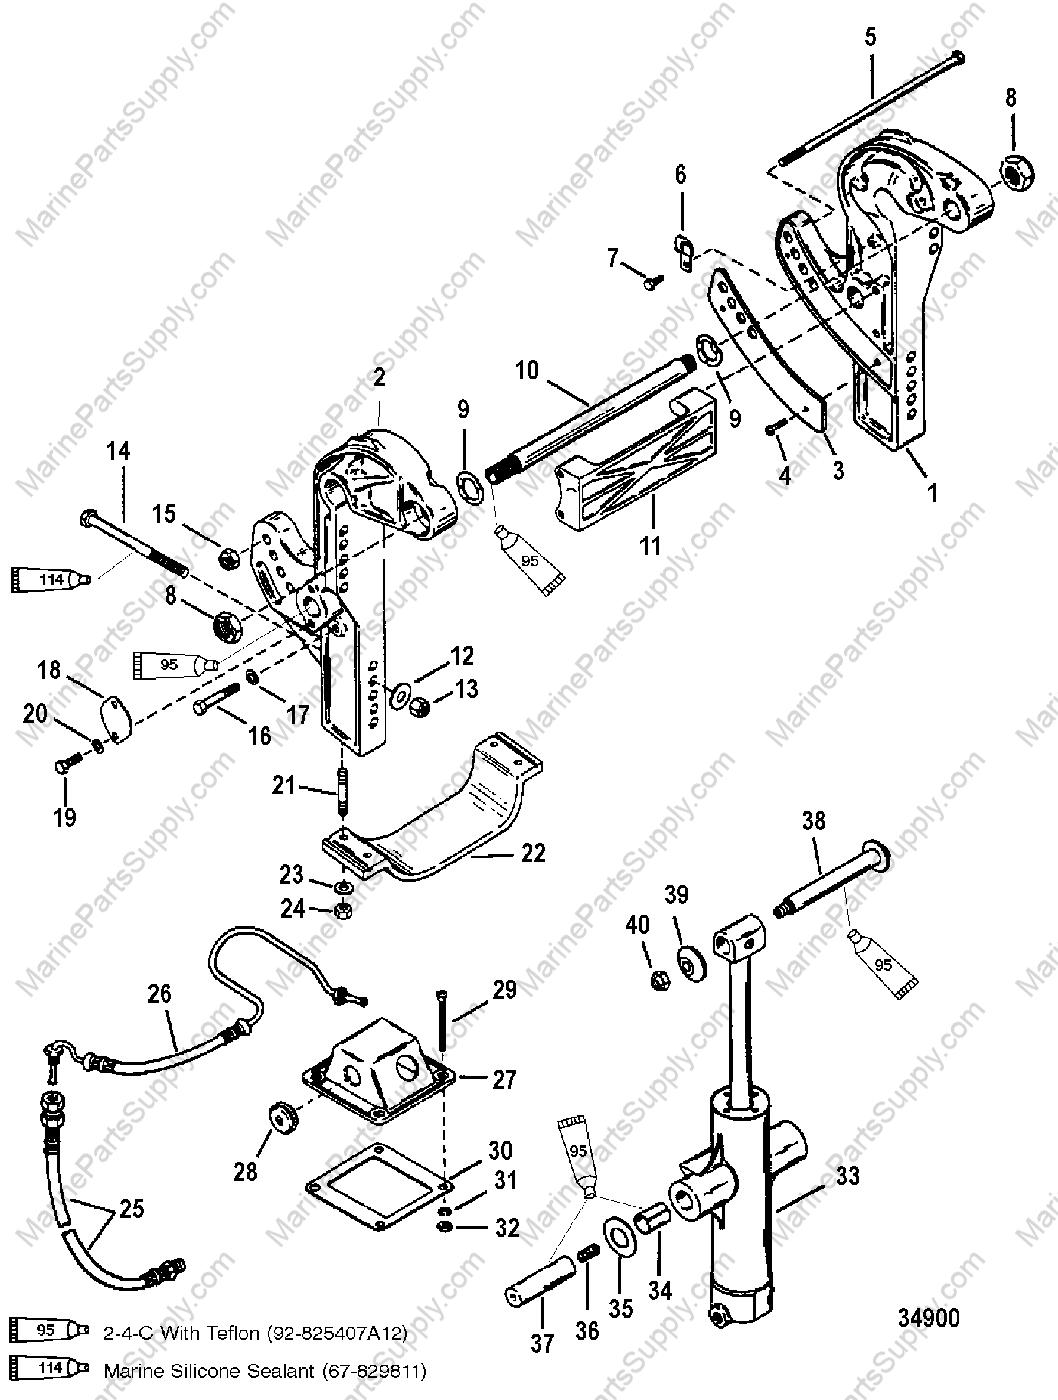 Wiring harness diagram besides schematic power steering fluid bmw likewise bmw e46 radio wiring harness besides